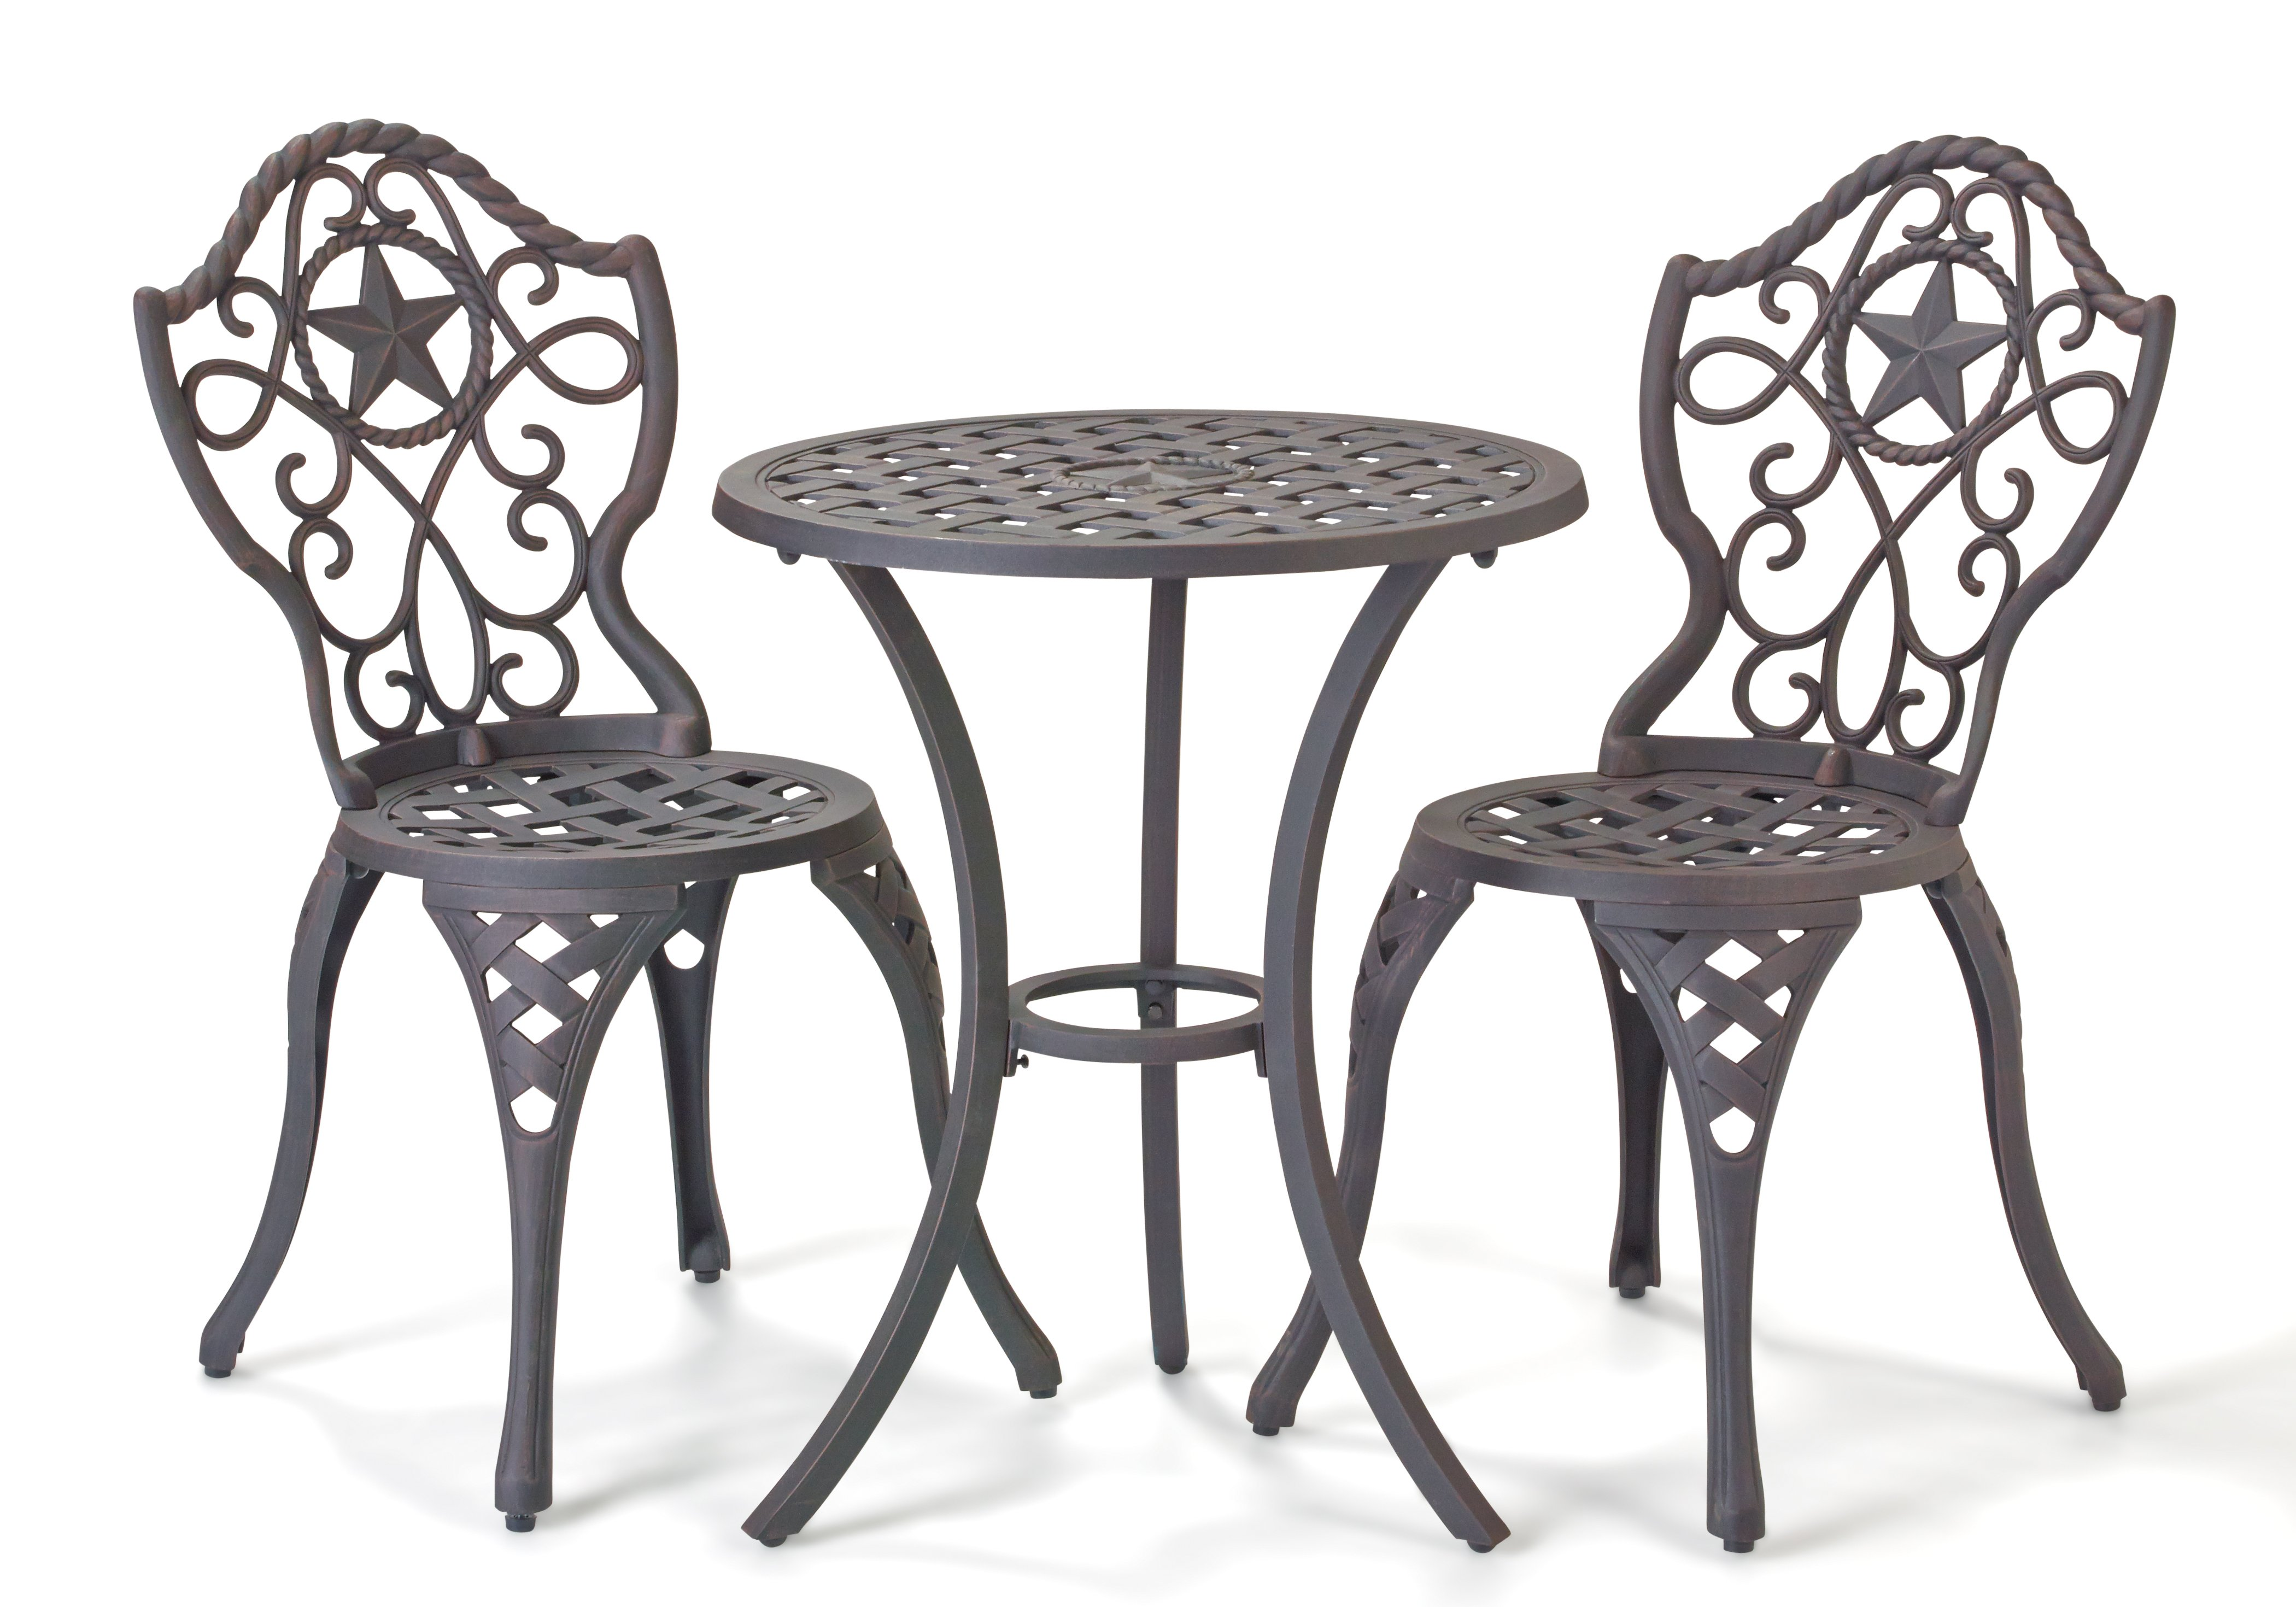 heb texas patio furniture patio ideas rh divesibulan com heb outdoor furniture